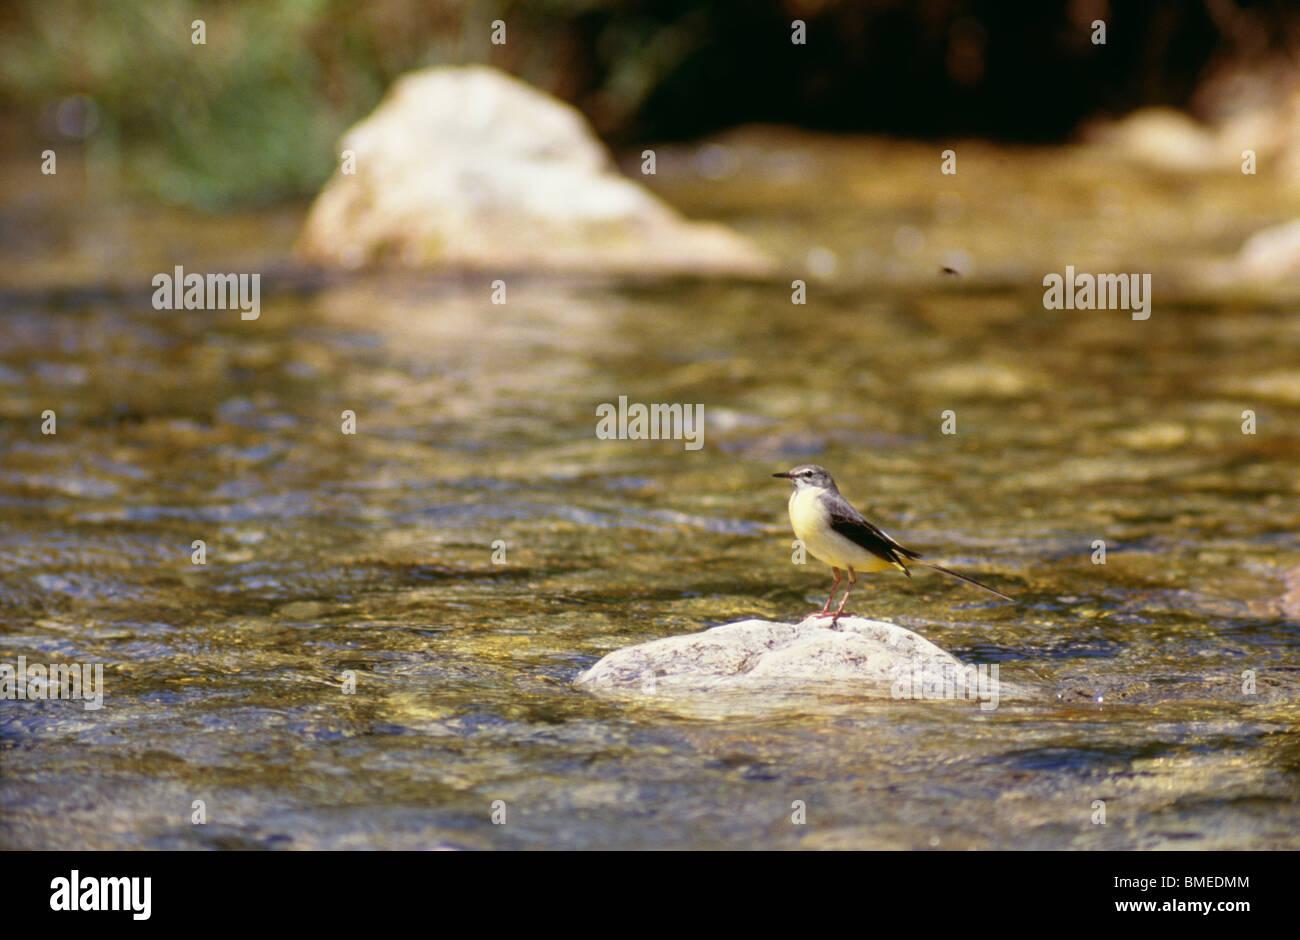 Bird perching on rock - Stock Image